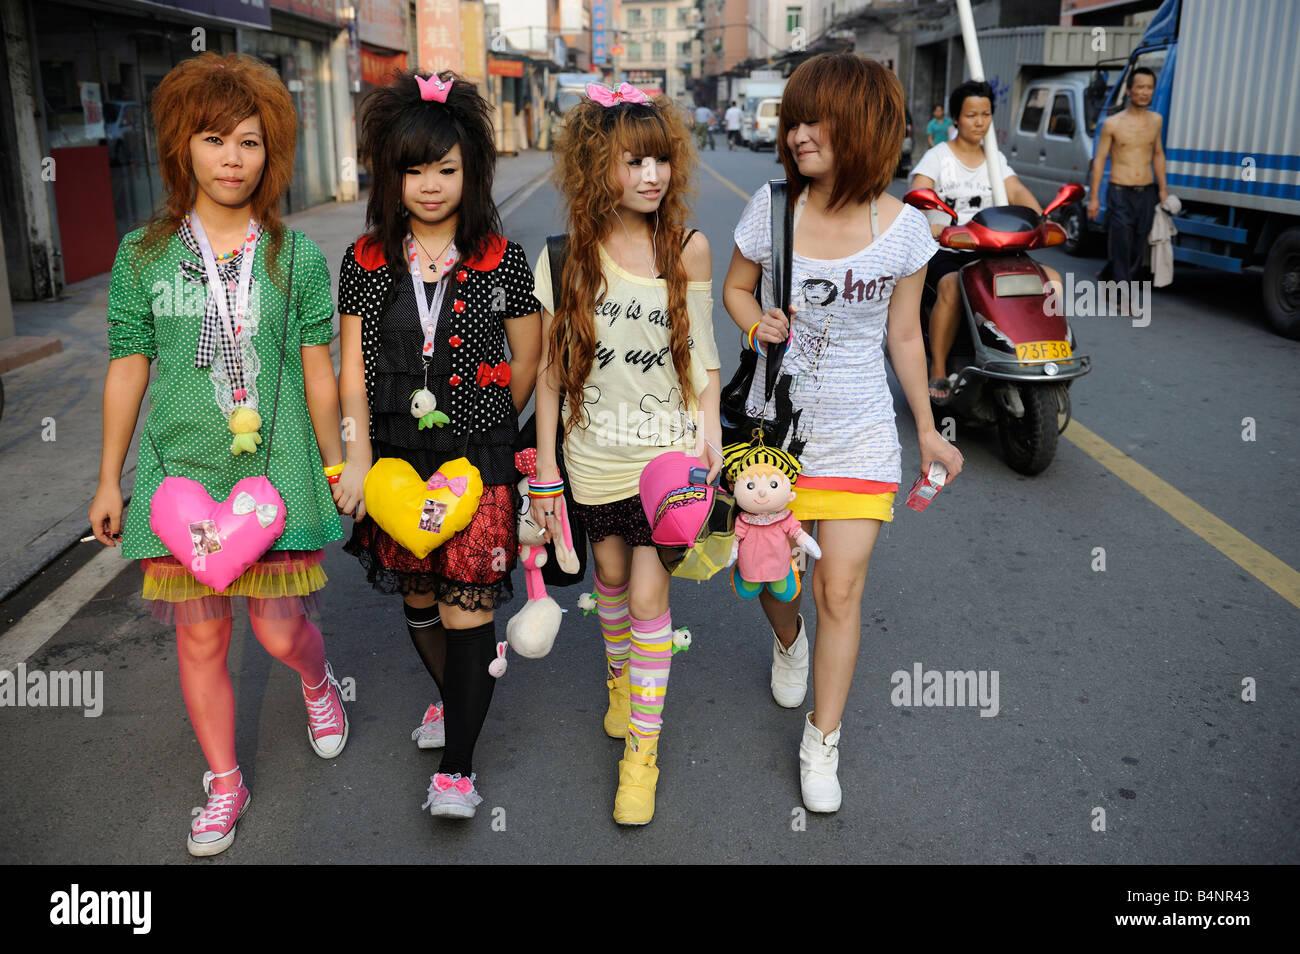 Four girls walking in a street in Dongguan, Guangdong, China. 20-Sep-2008 - Stock Image